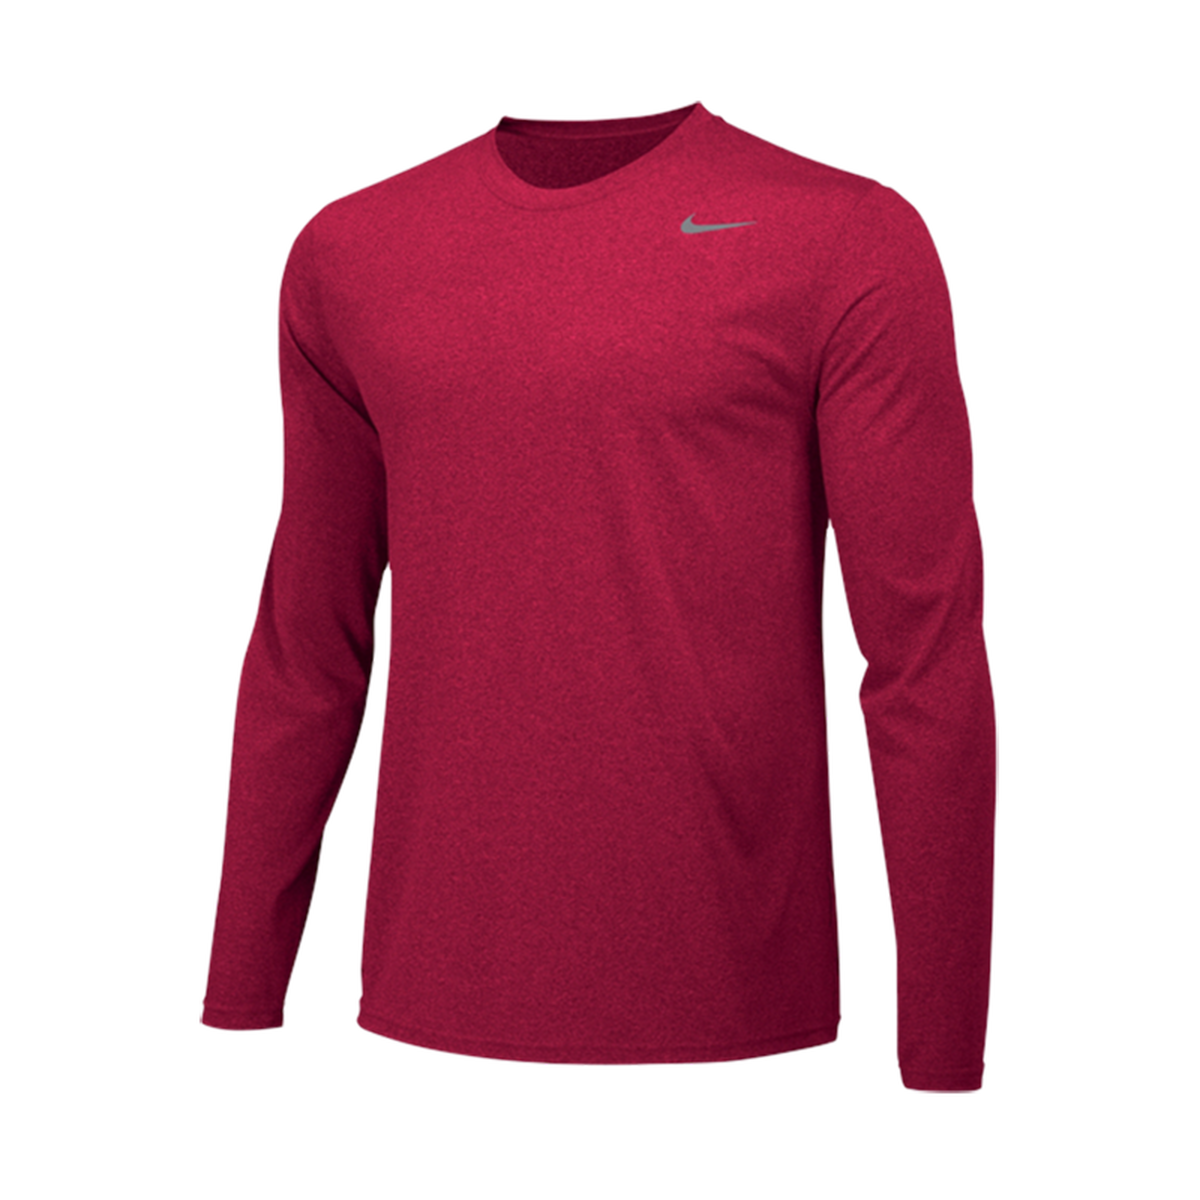 new concept e13d7 397ce Images. Nike Team Legend Long Sleeve Crew